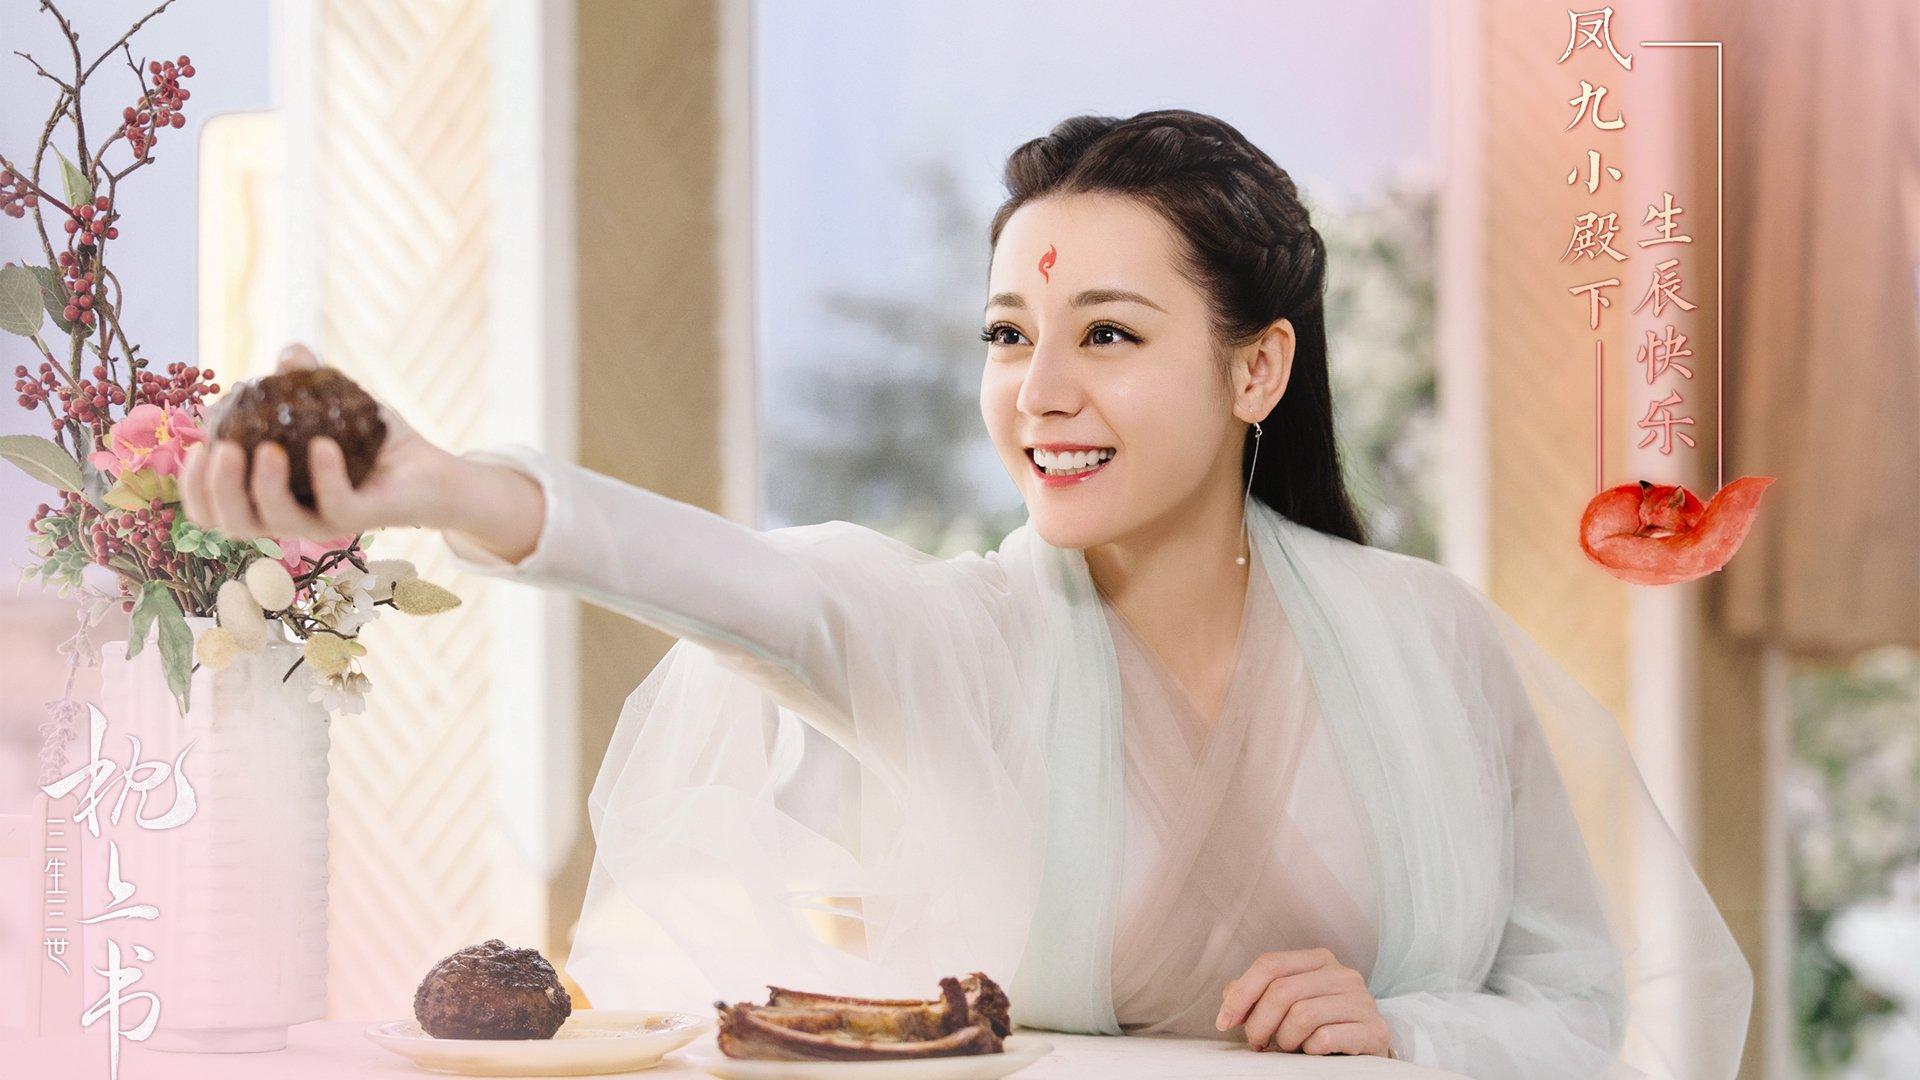 seo分享:SEO中如何利用分享提高工作效率?